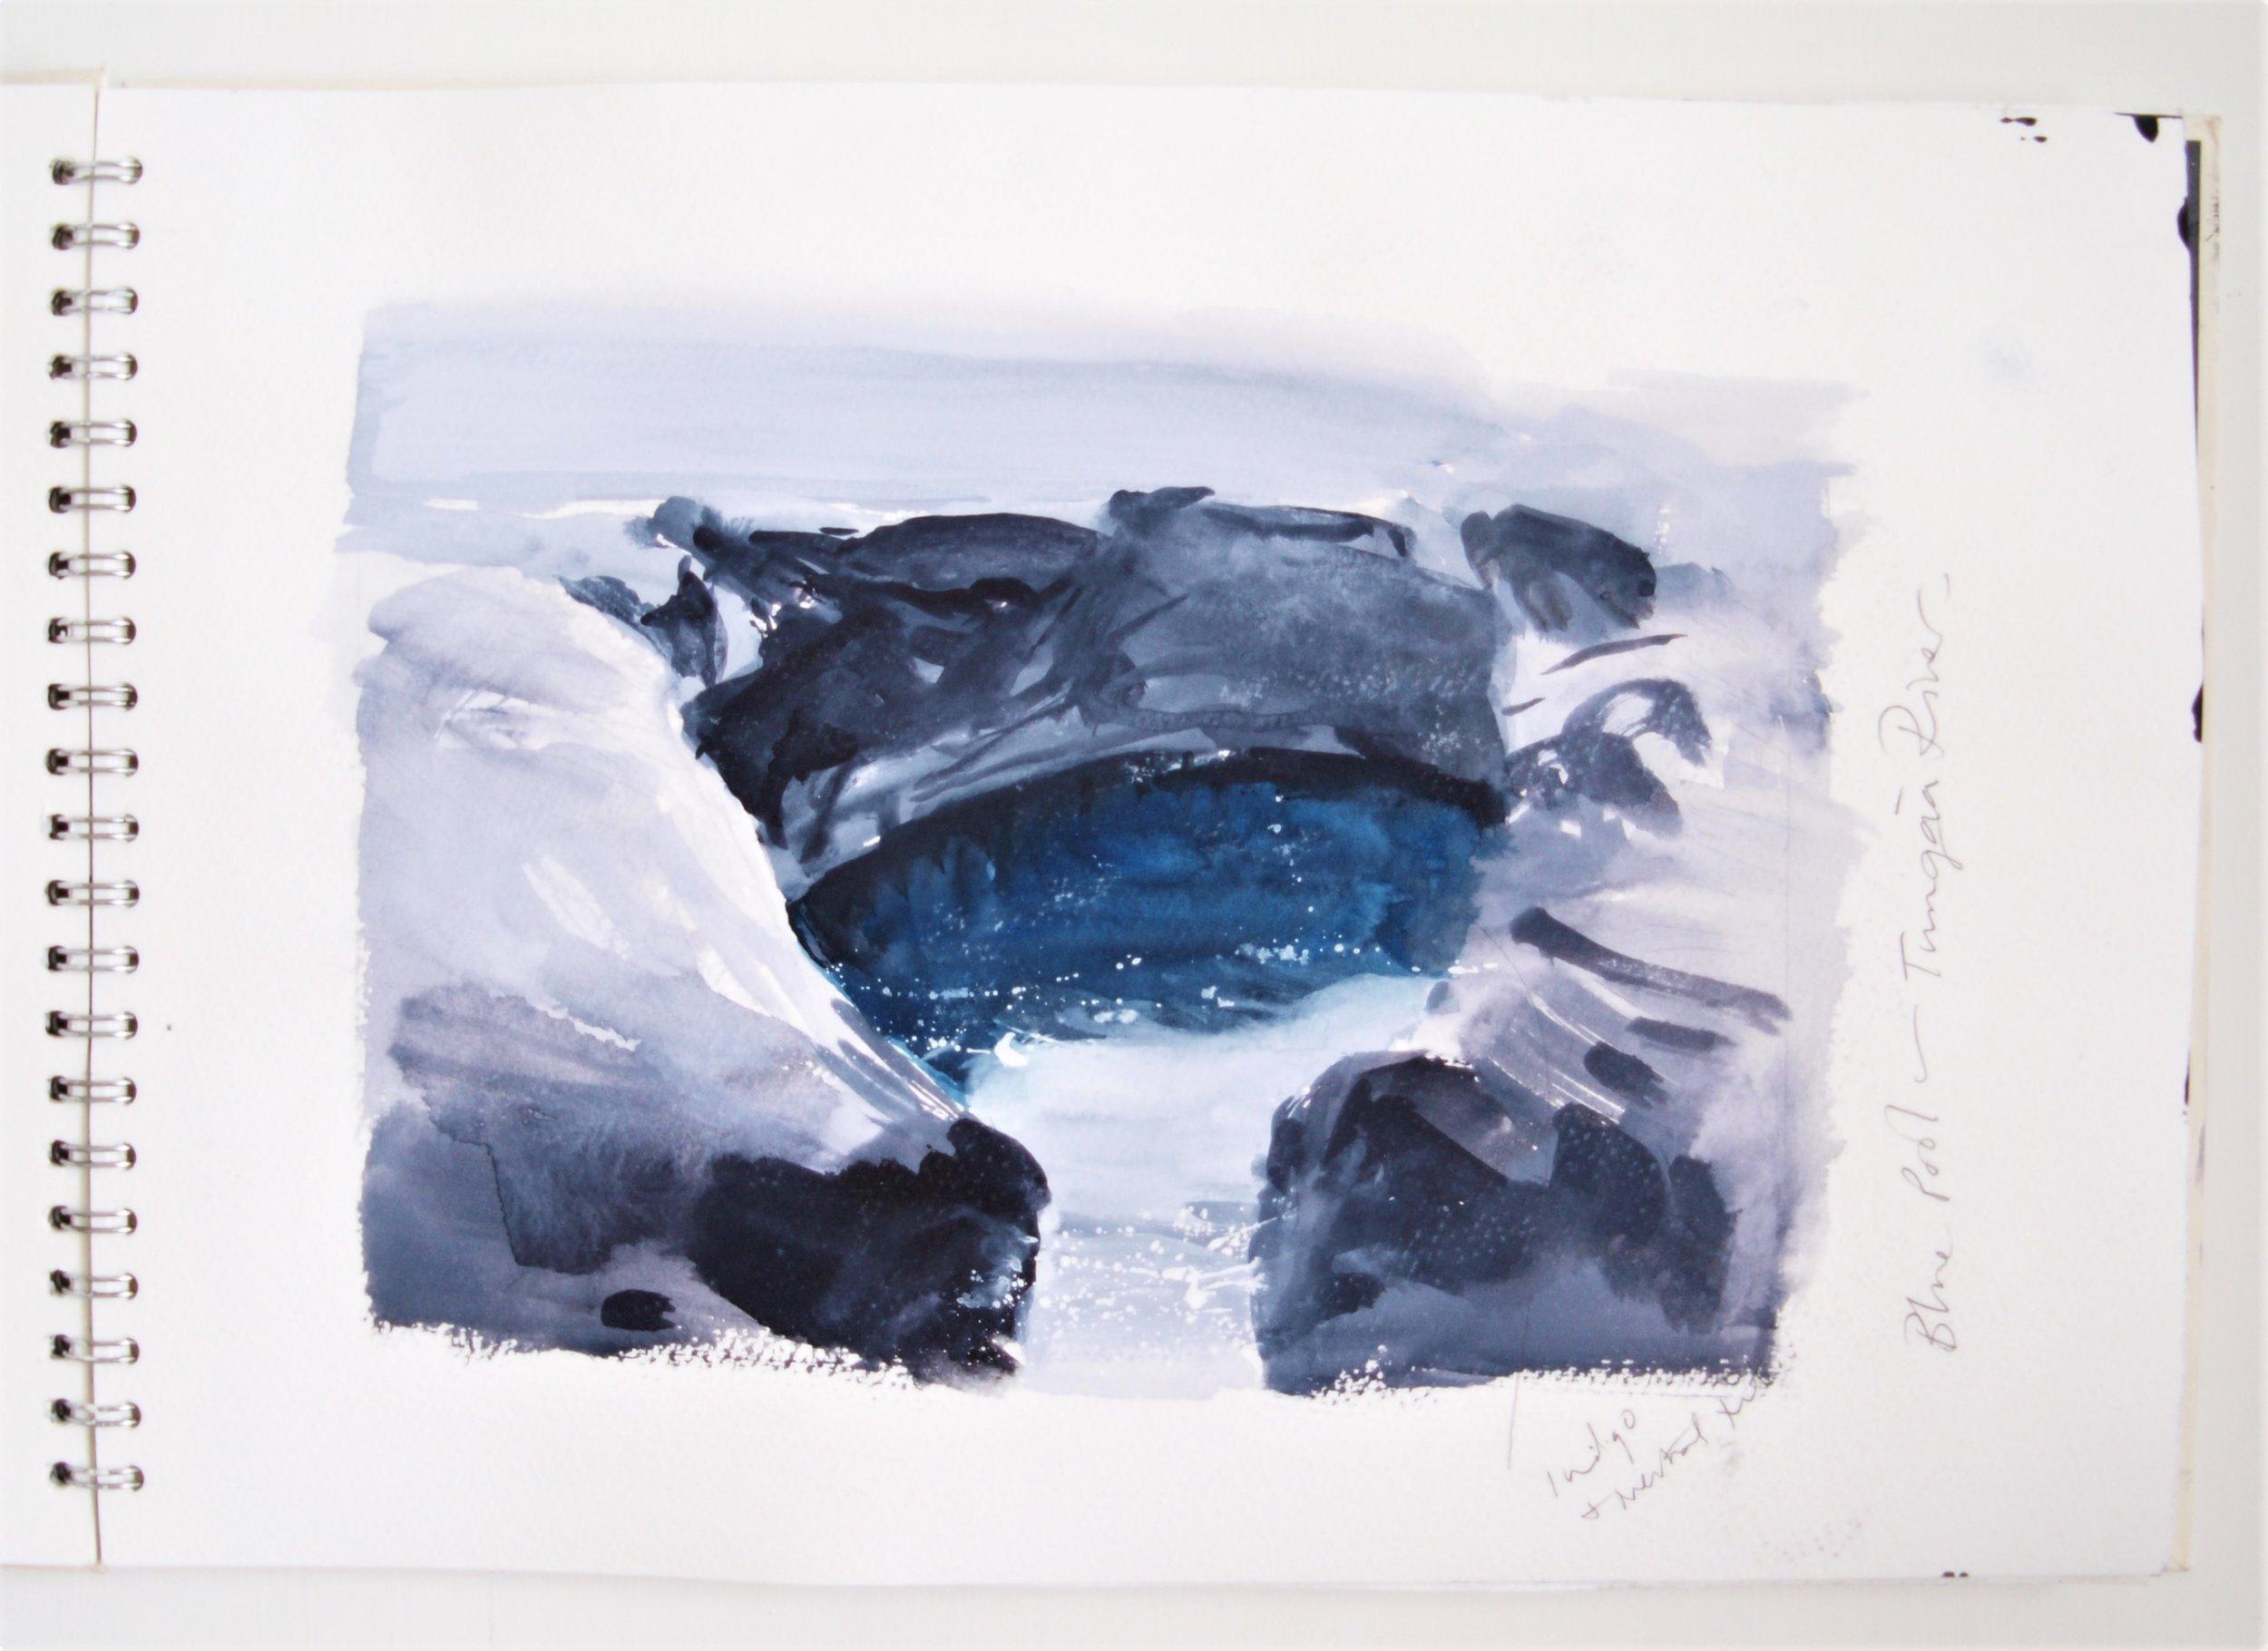 ICELAND LIGHT INTO DARK Sketchbook 2016 (page 10) C.G.GUEST.JPG